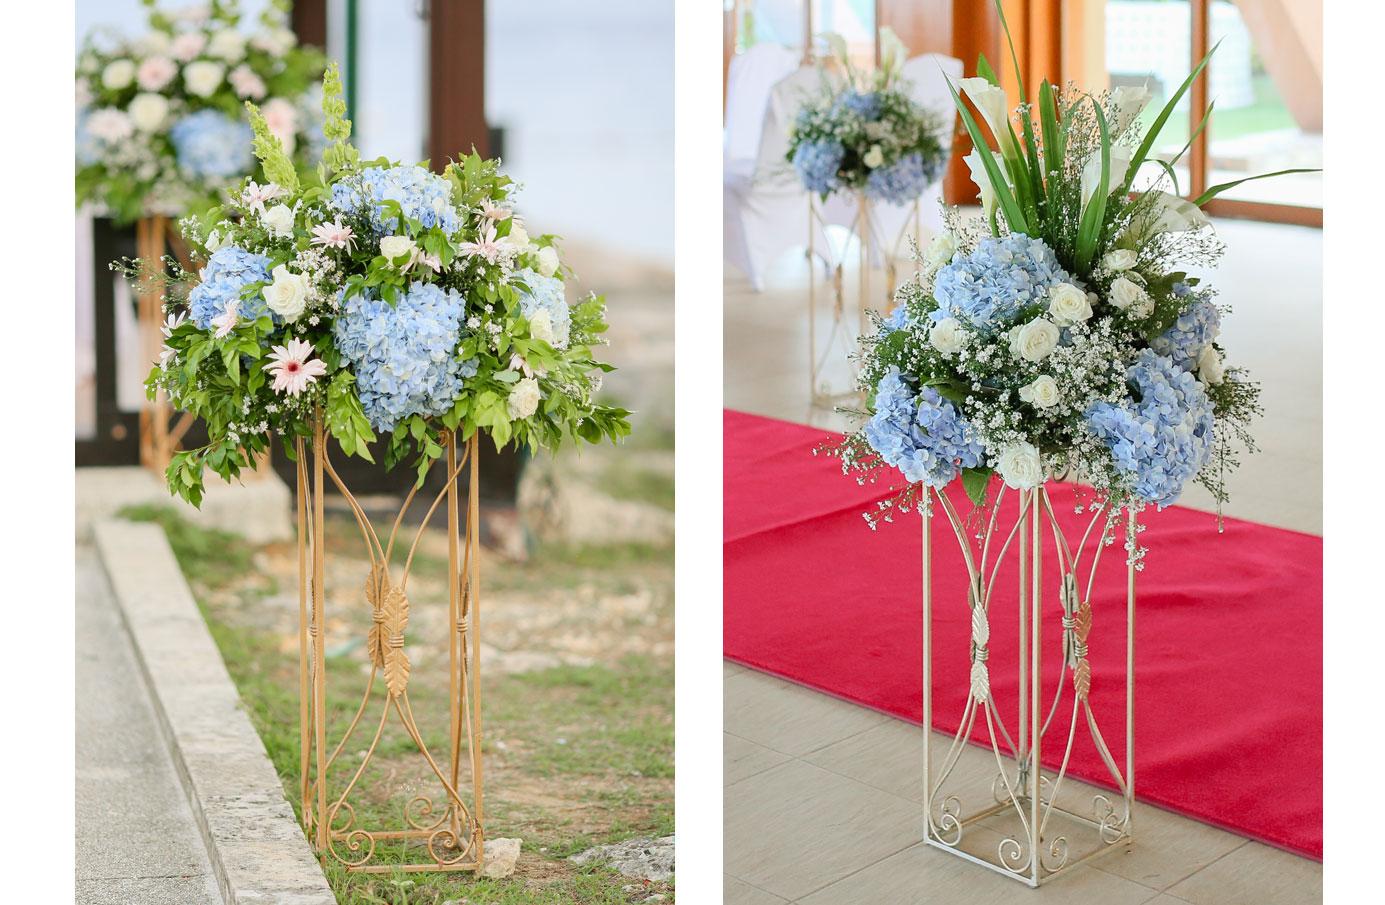 cebu-wedding-decoration (6)